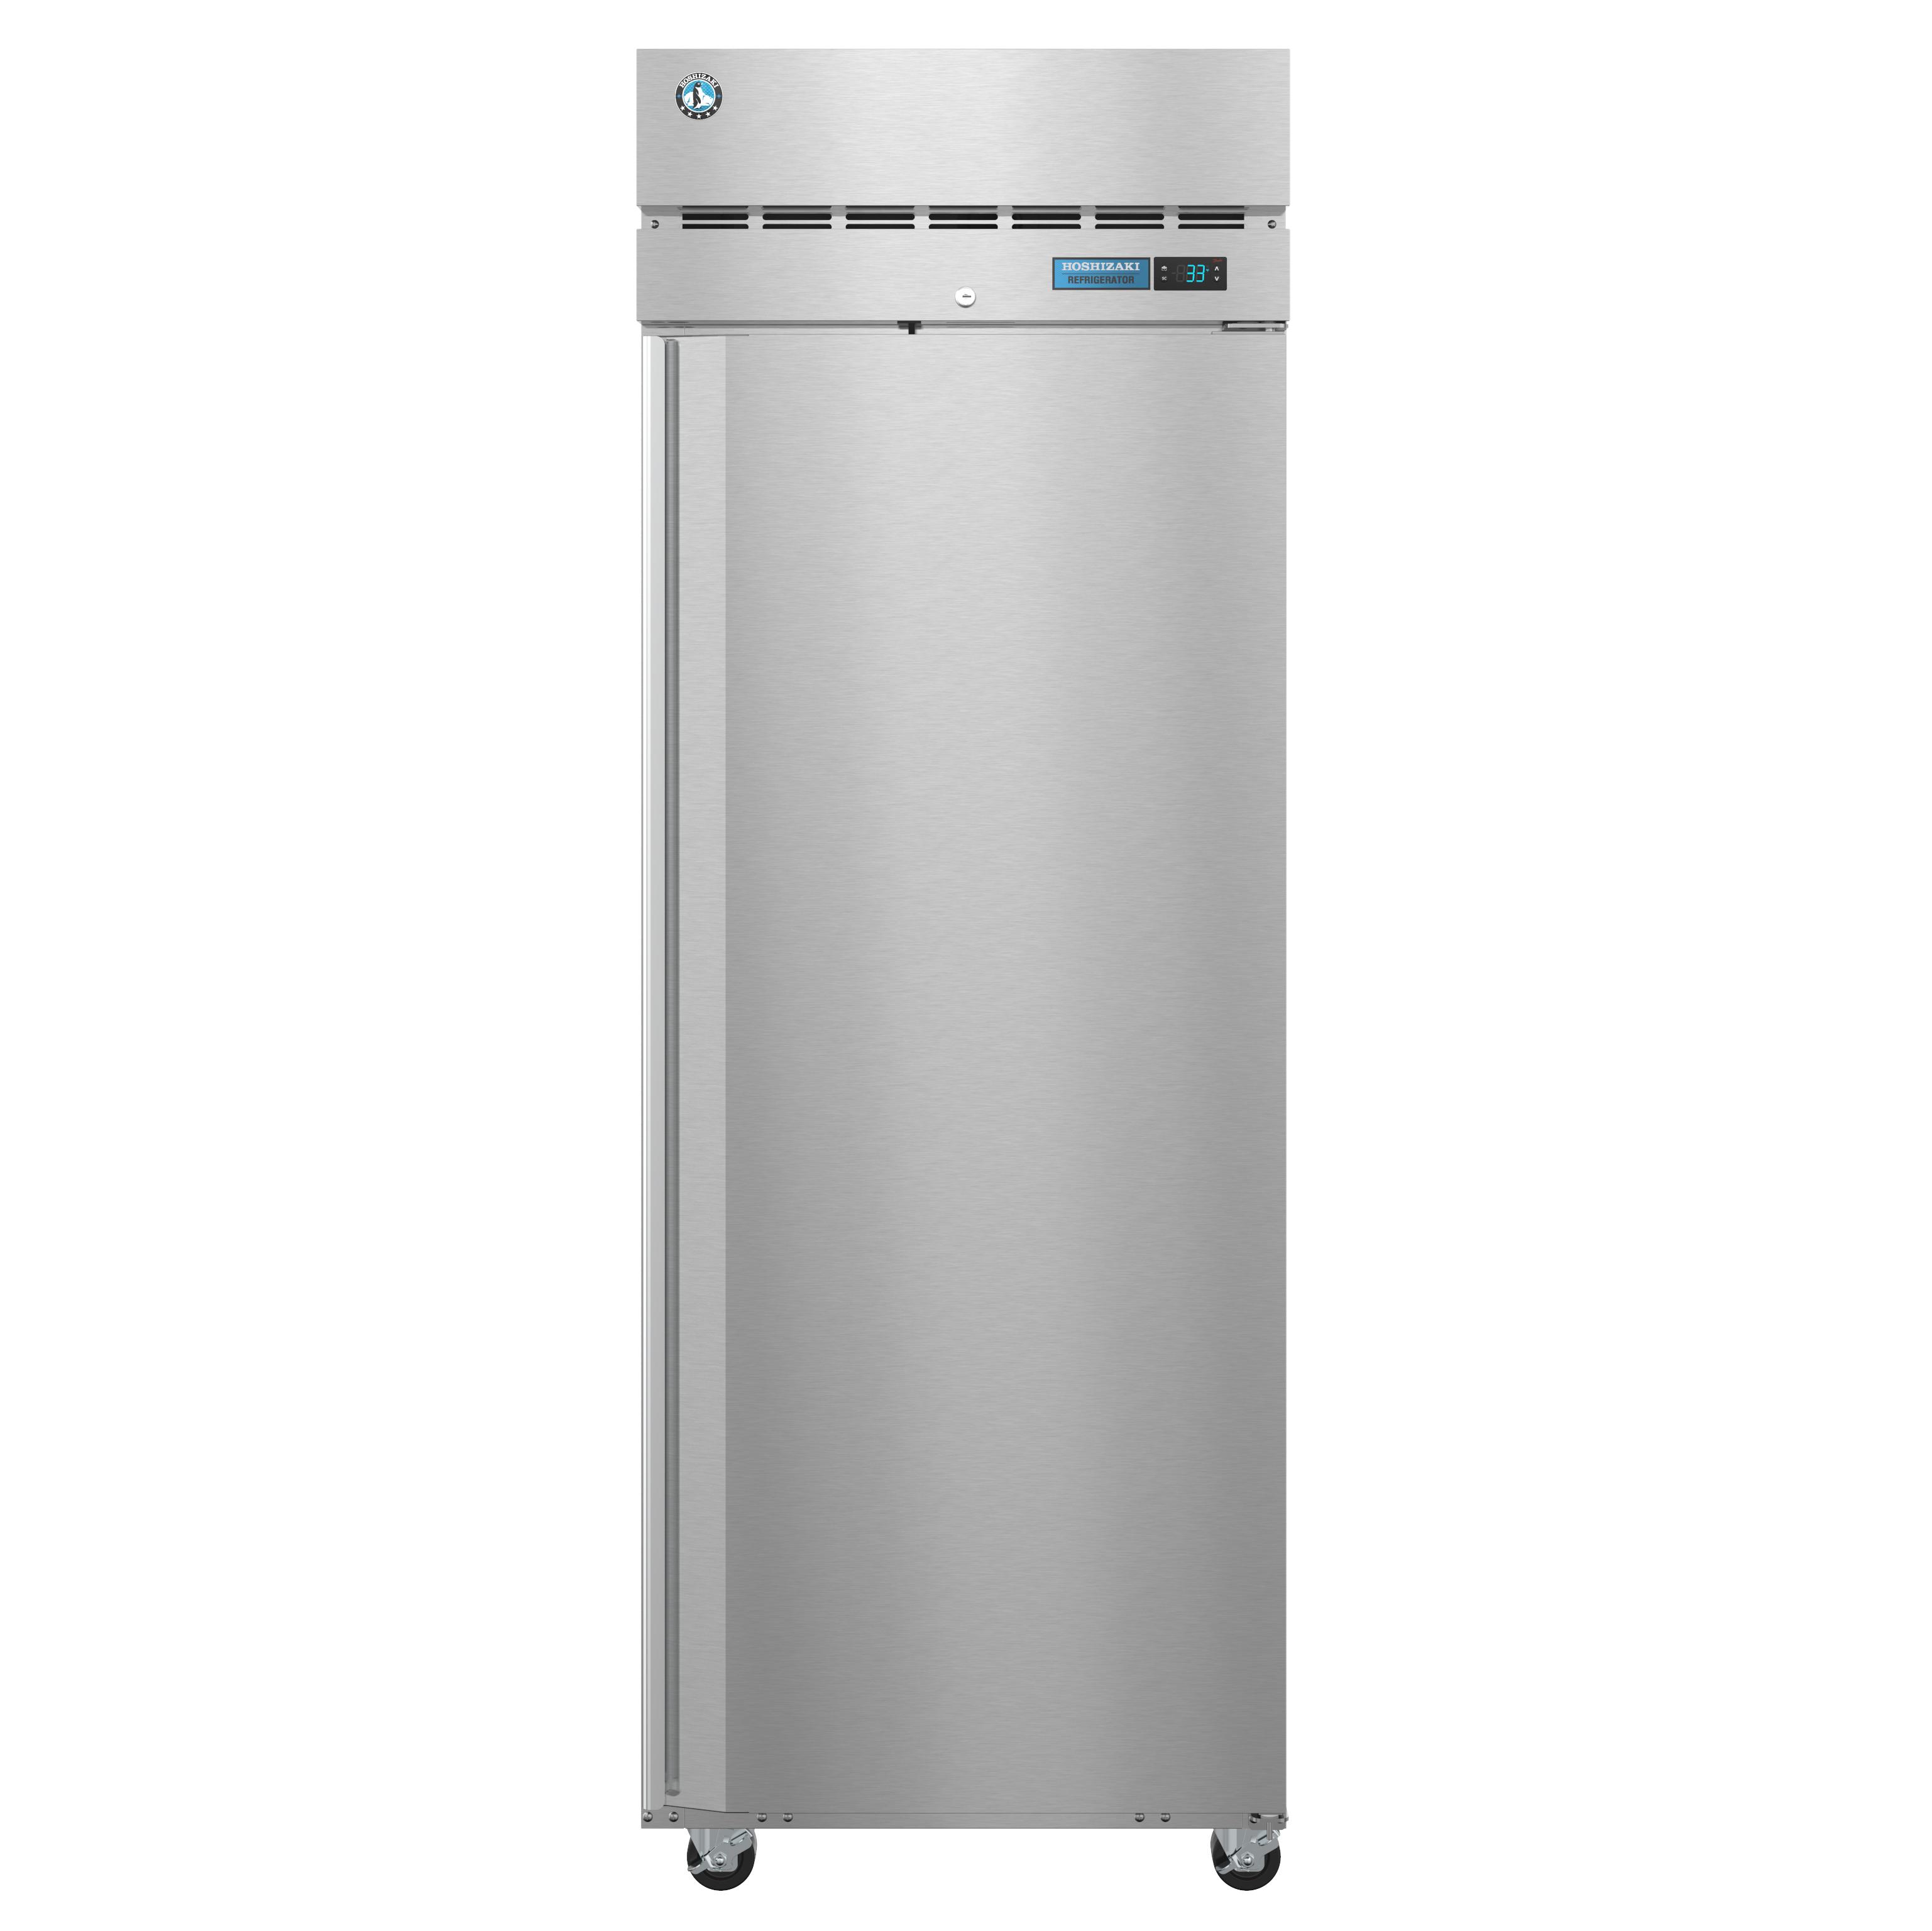 Hoshizaki R1A-FS reach-in refrigerators & freezers